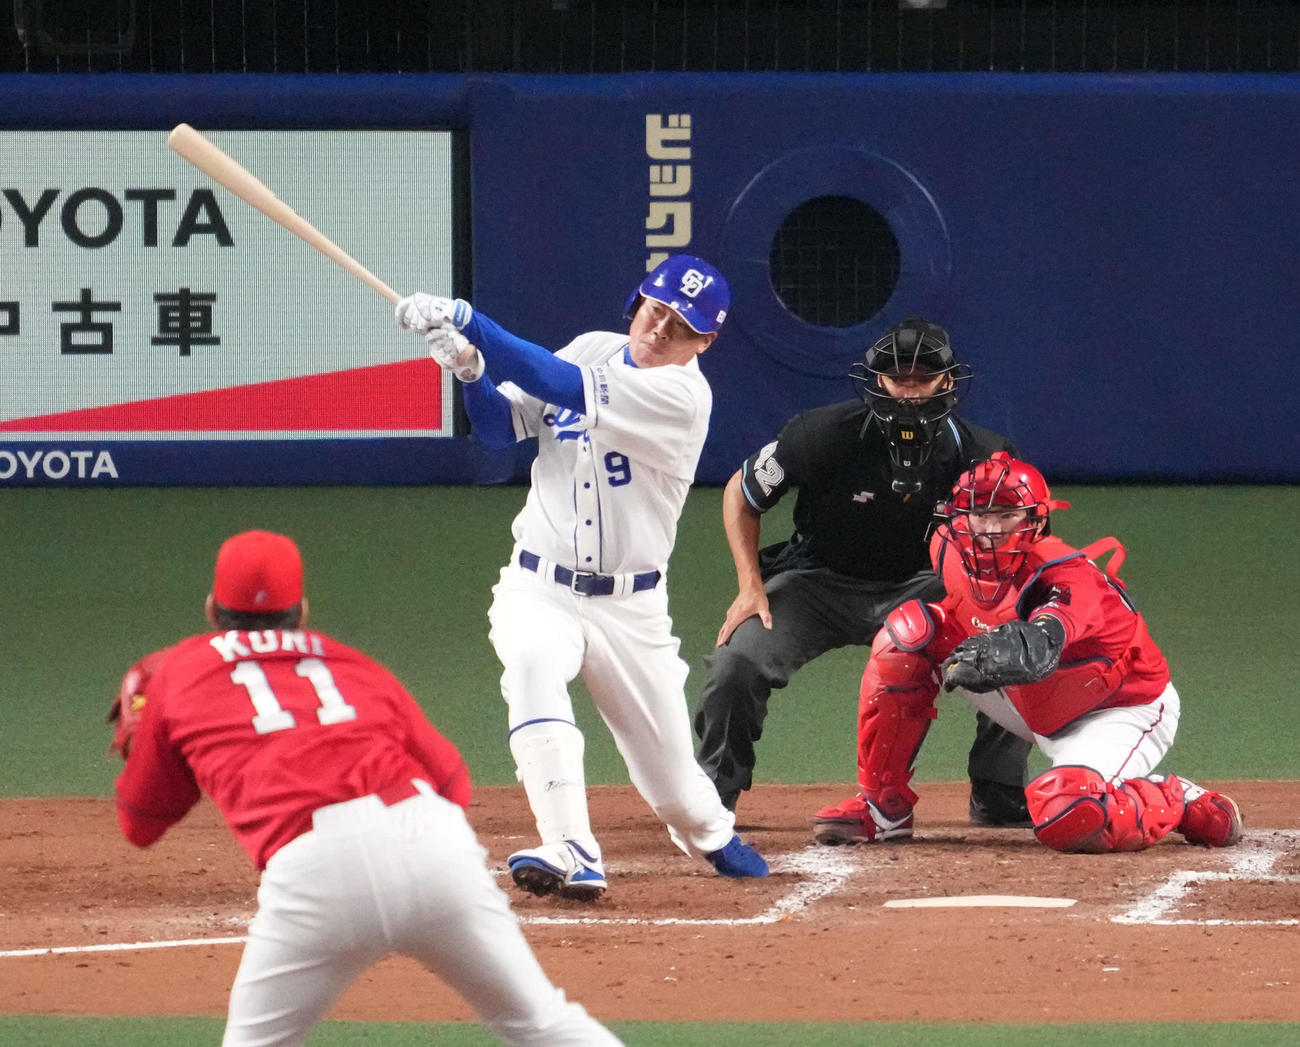 21年4月17日、中日対広島 4回裏中日1死二塁、右適時二塁打を放った福留